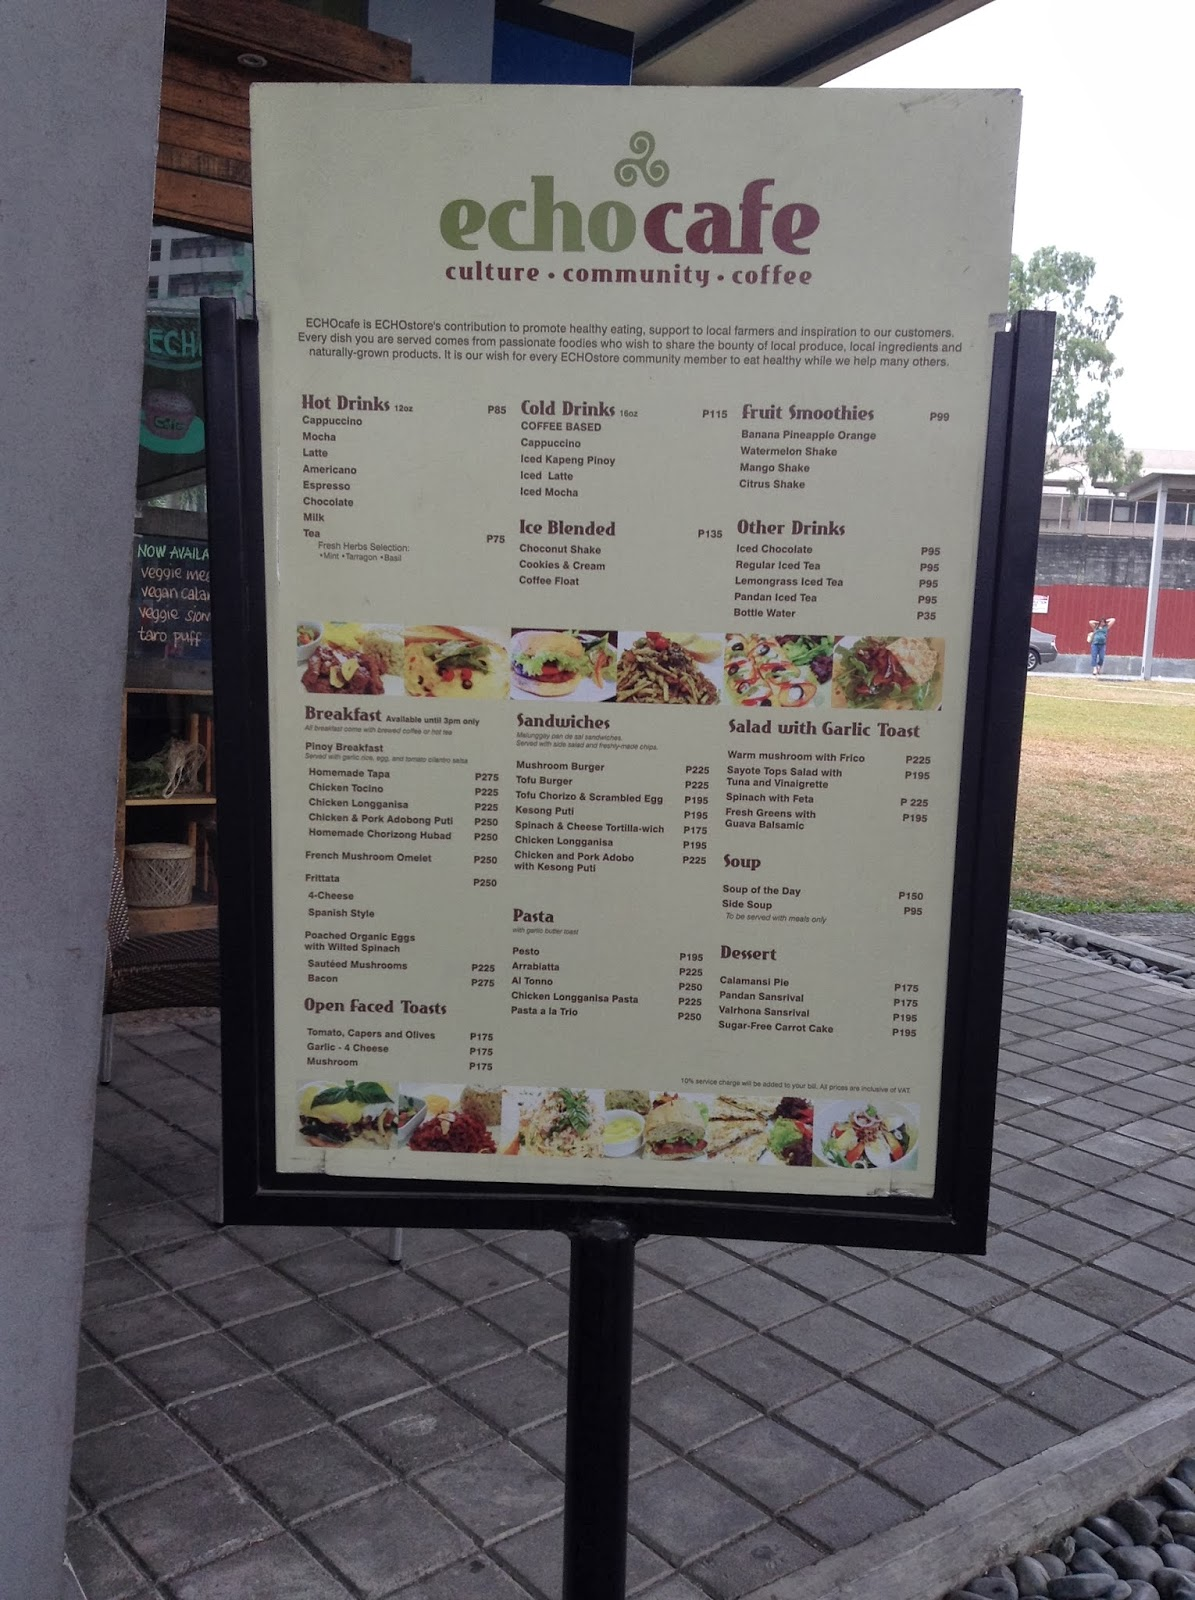 Looking at the echocafe menu